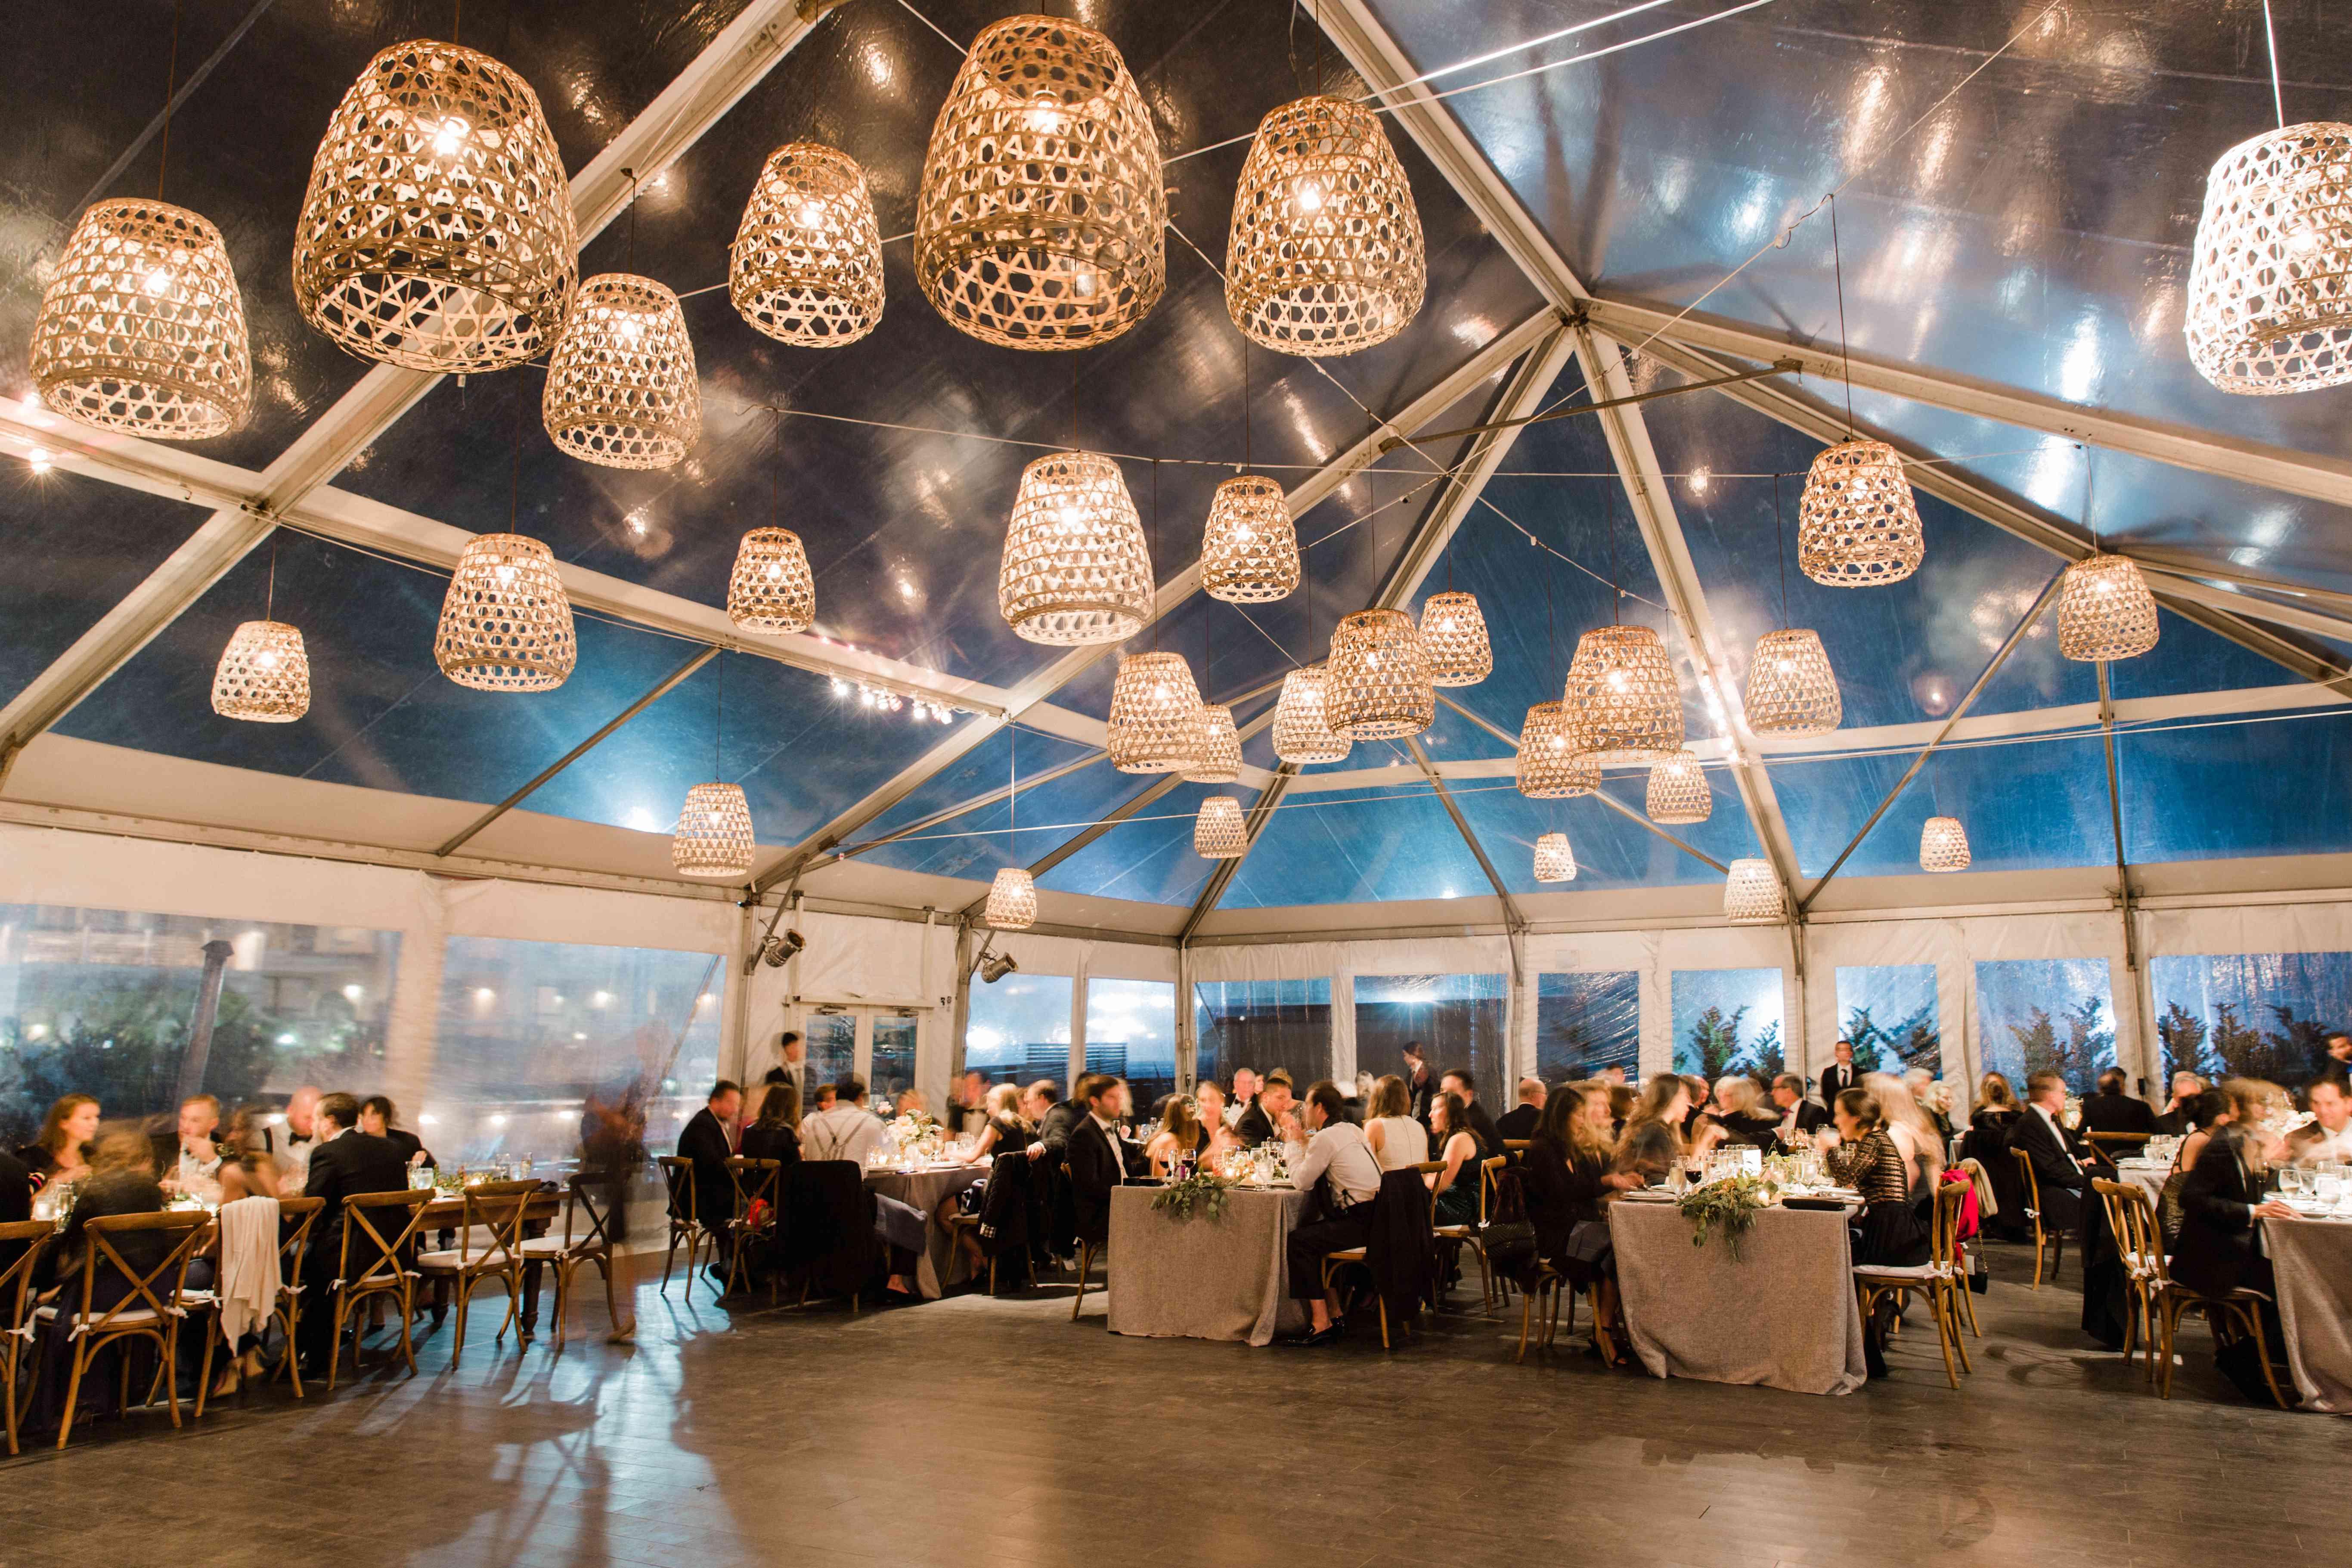 <p>tent reception lanterns wedding guests</p><br><br>